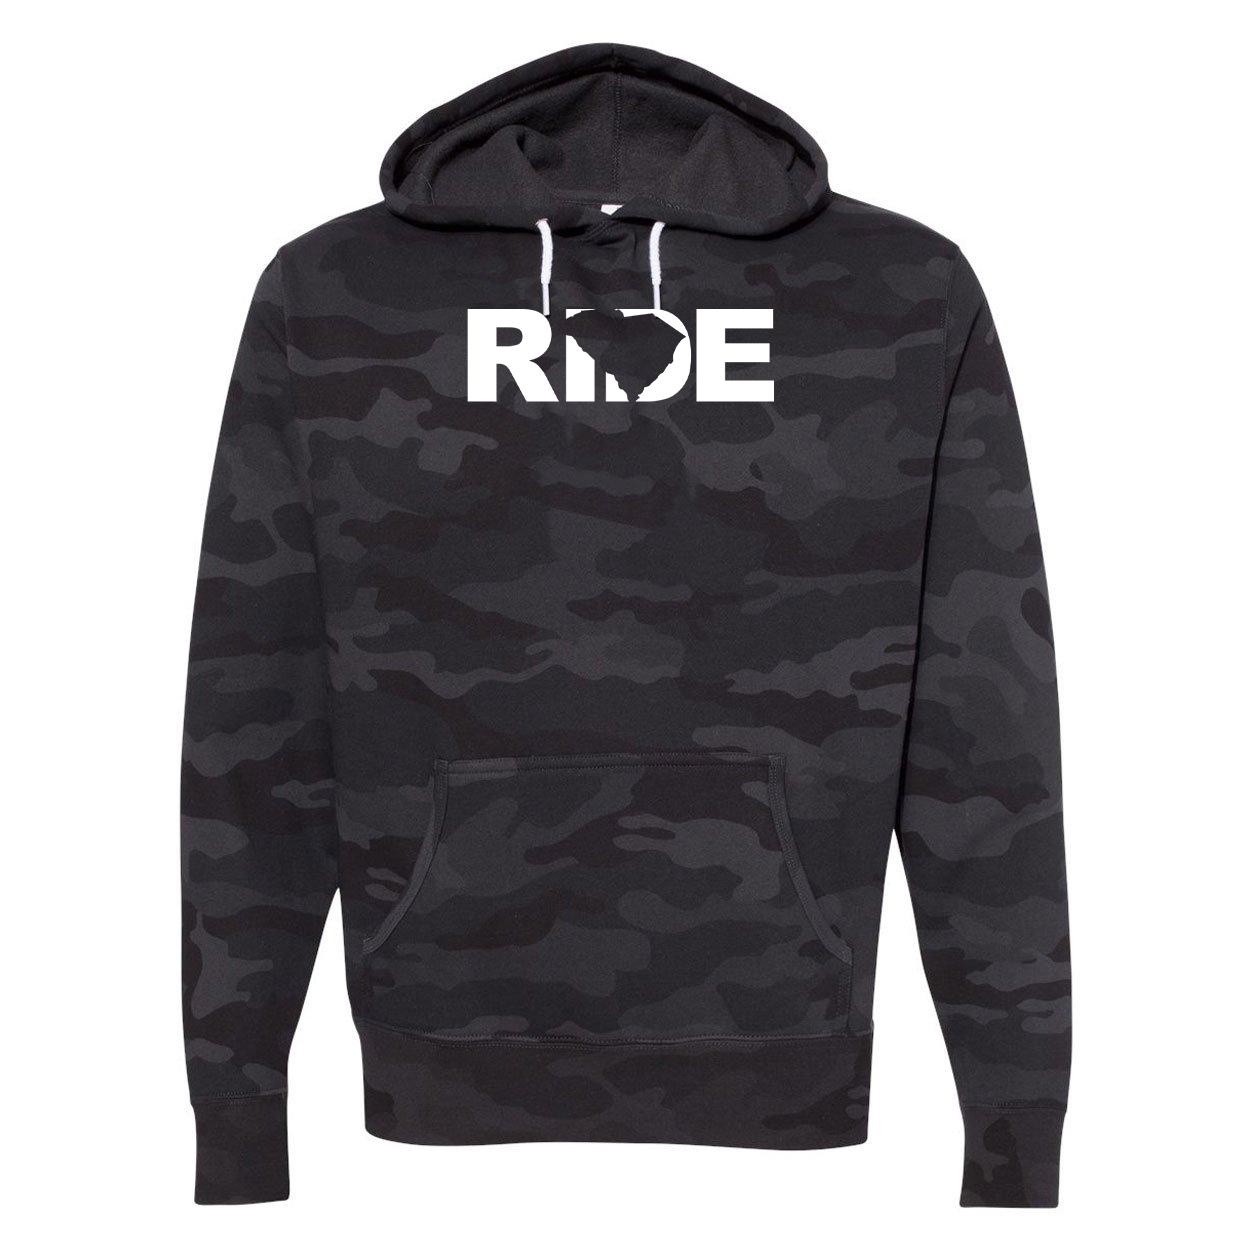 Ride South Carolina Classic Unisex Hooded Sweatshirt Black Camo (White Logo)